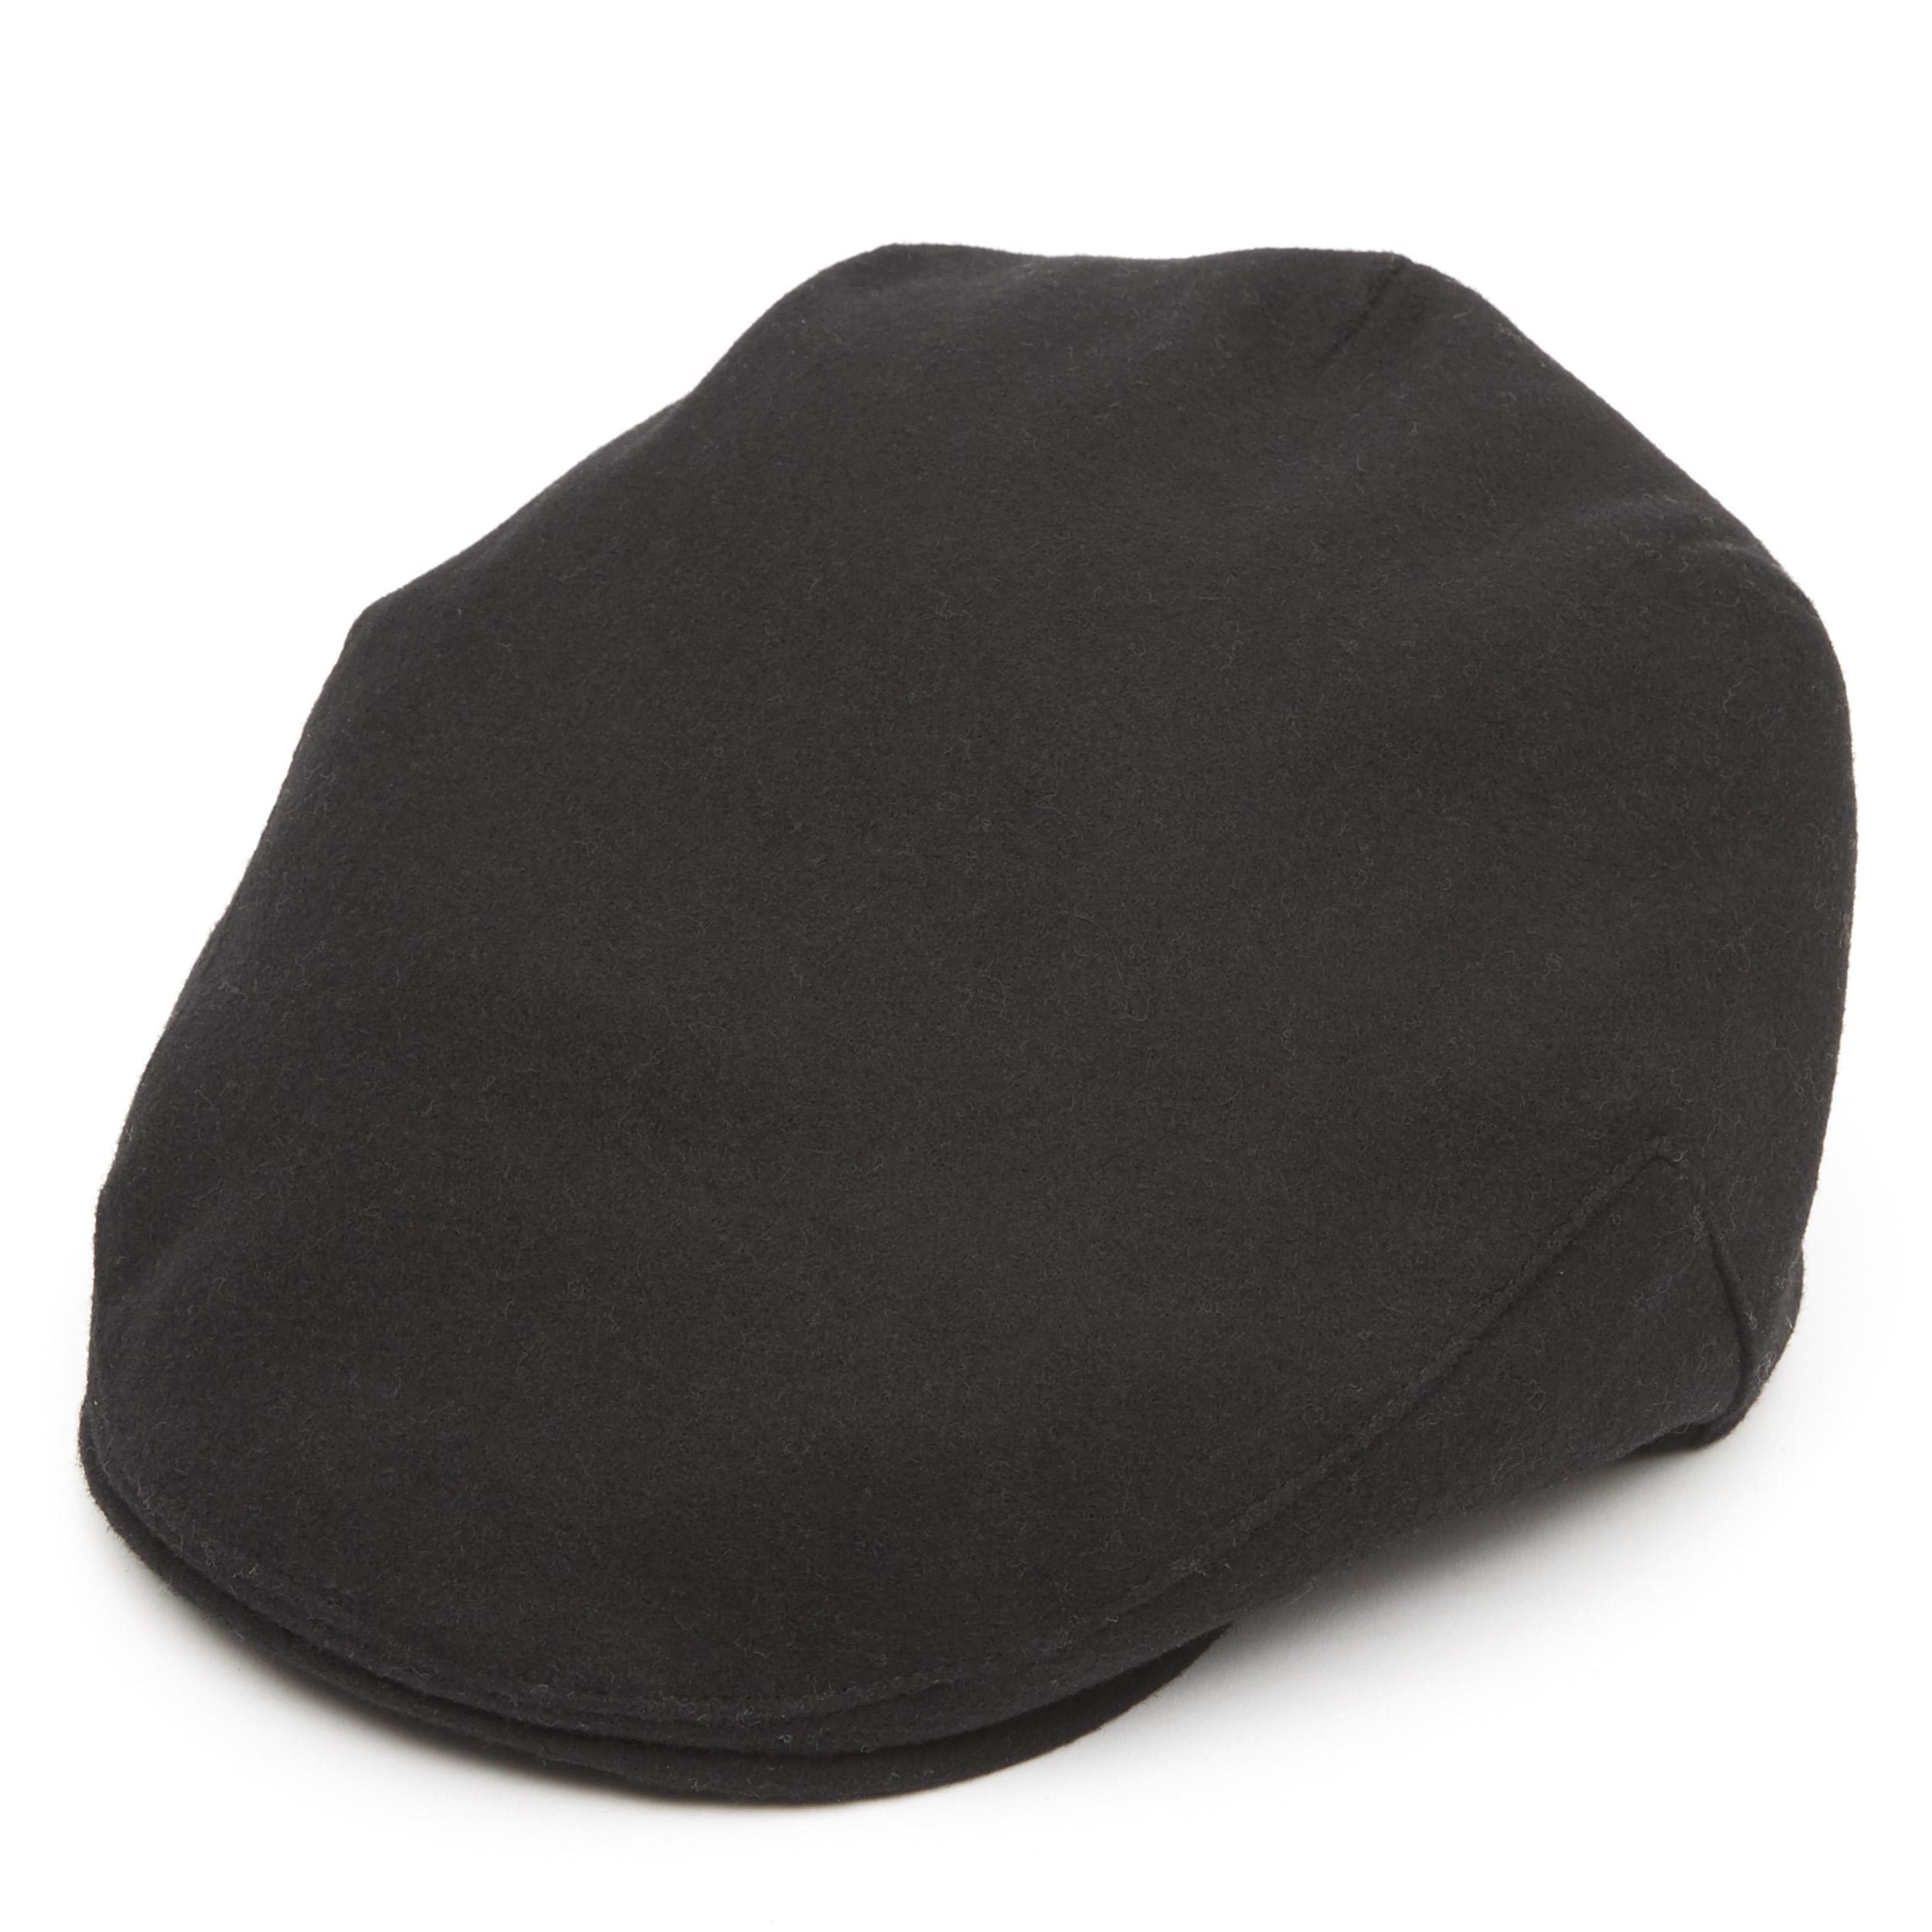 66743e91c5e Lyst - Christys  Balmoral Moleskin Cotton Cap in Black for Men